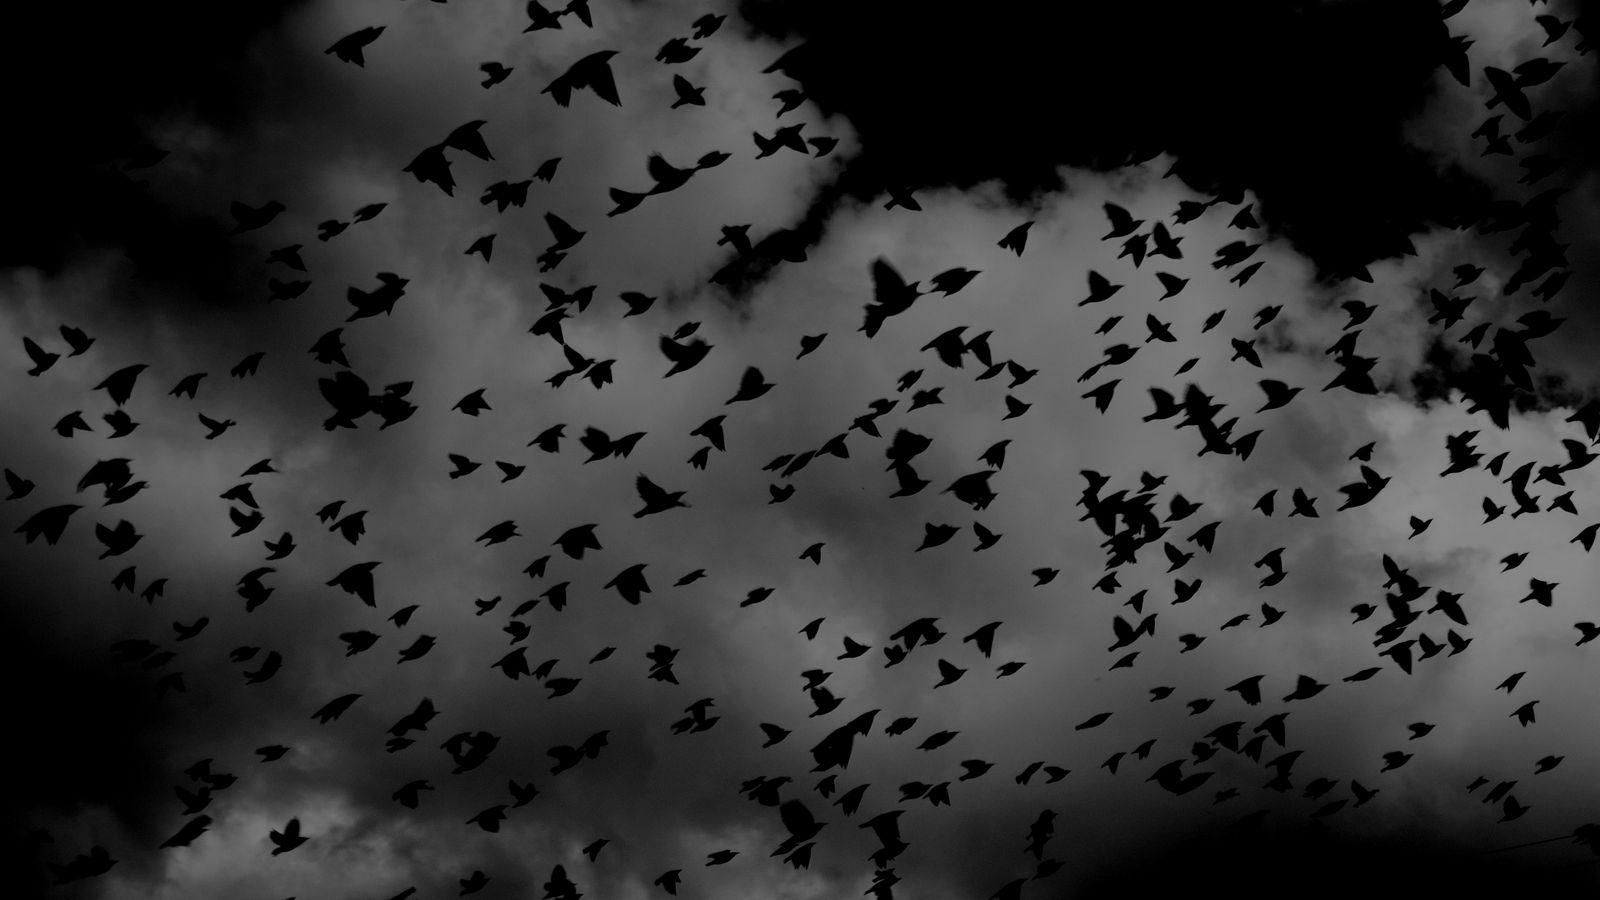 1600x900 Wallpaper birds, flock, dark, clouds, sky